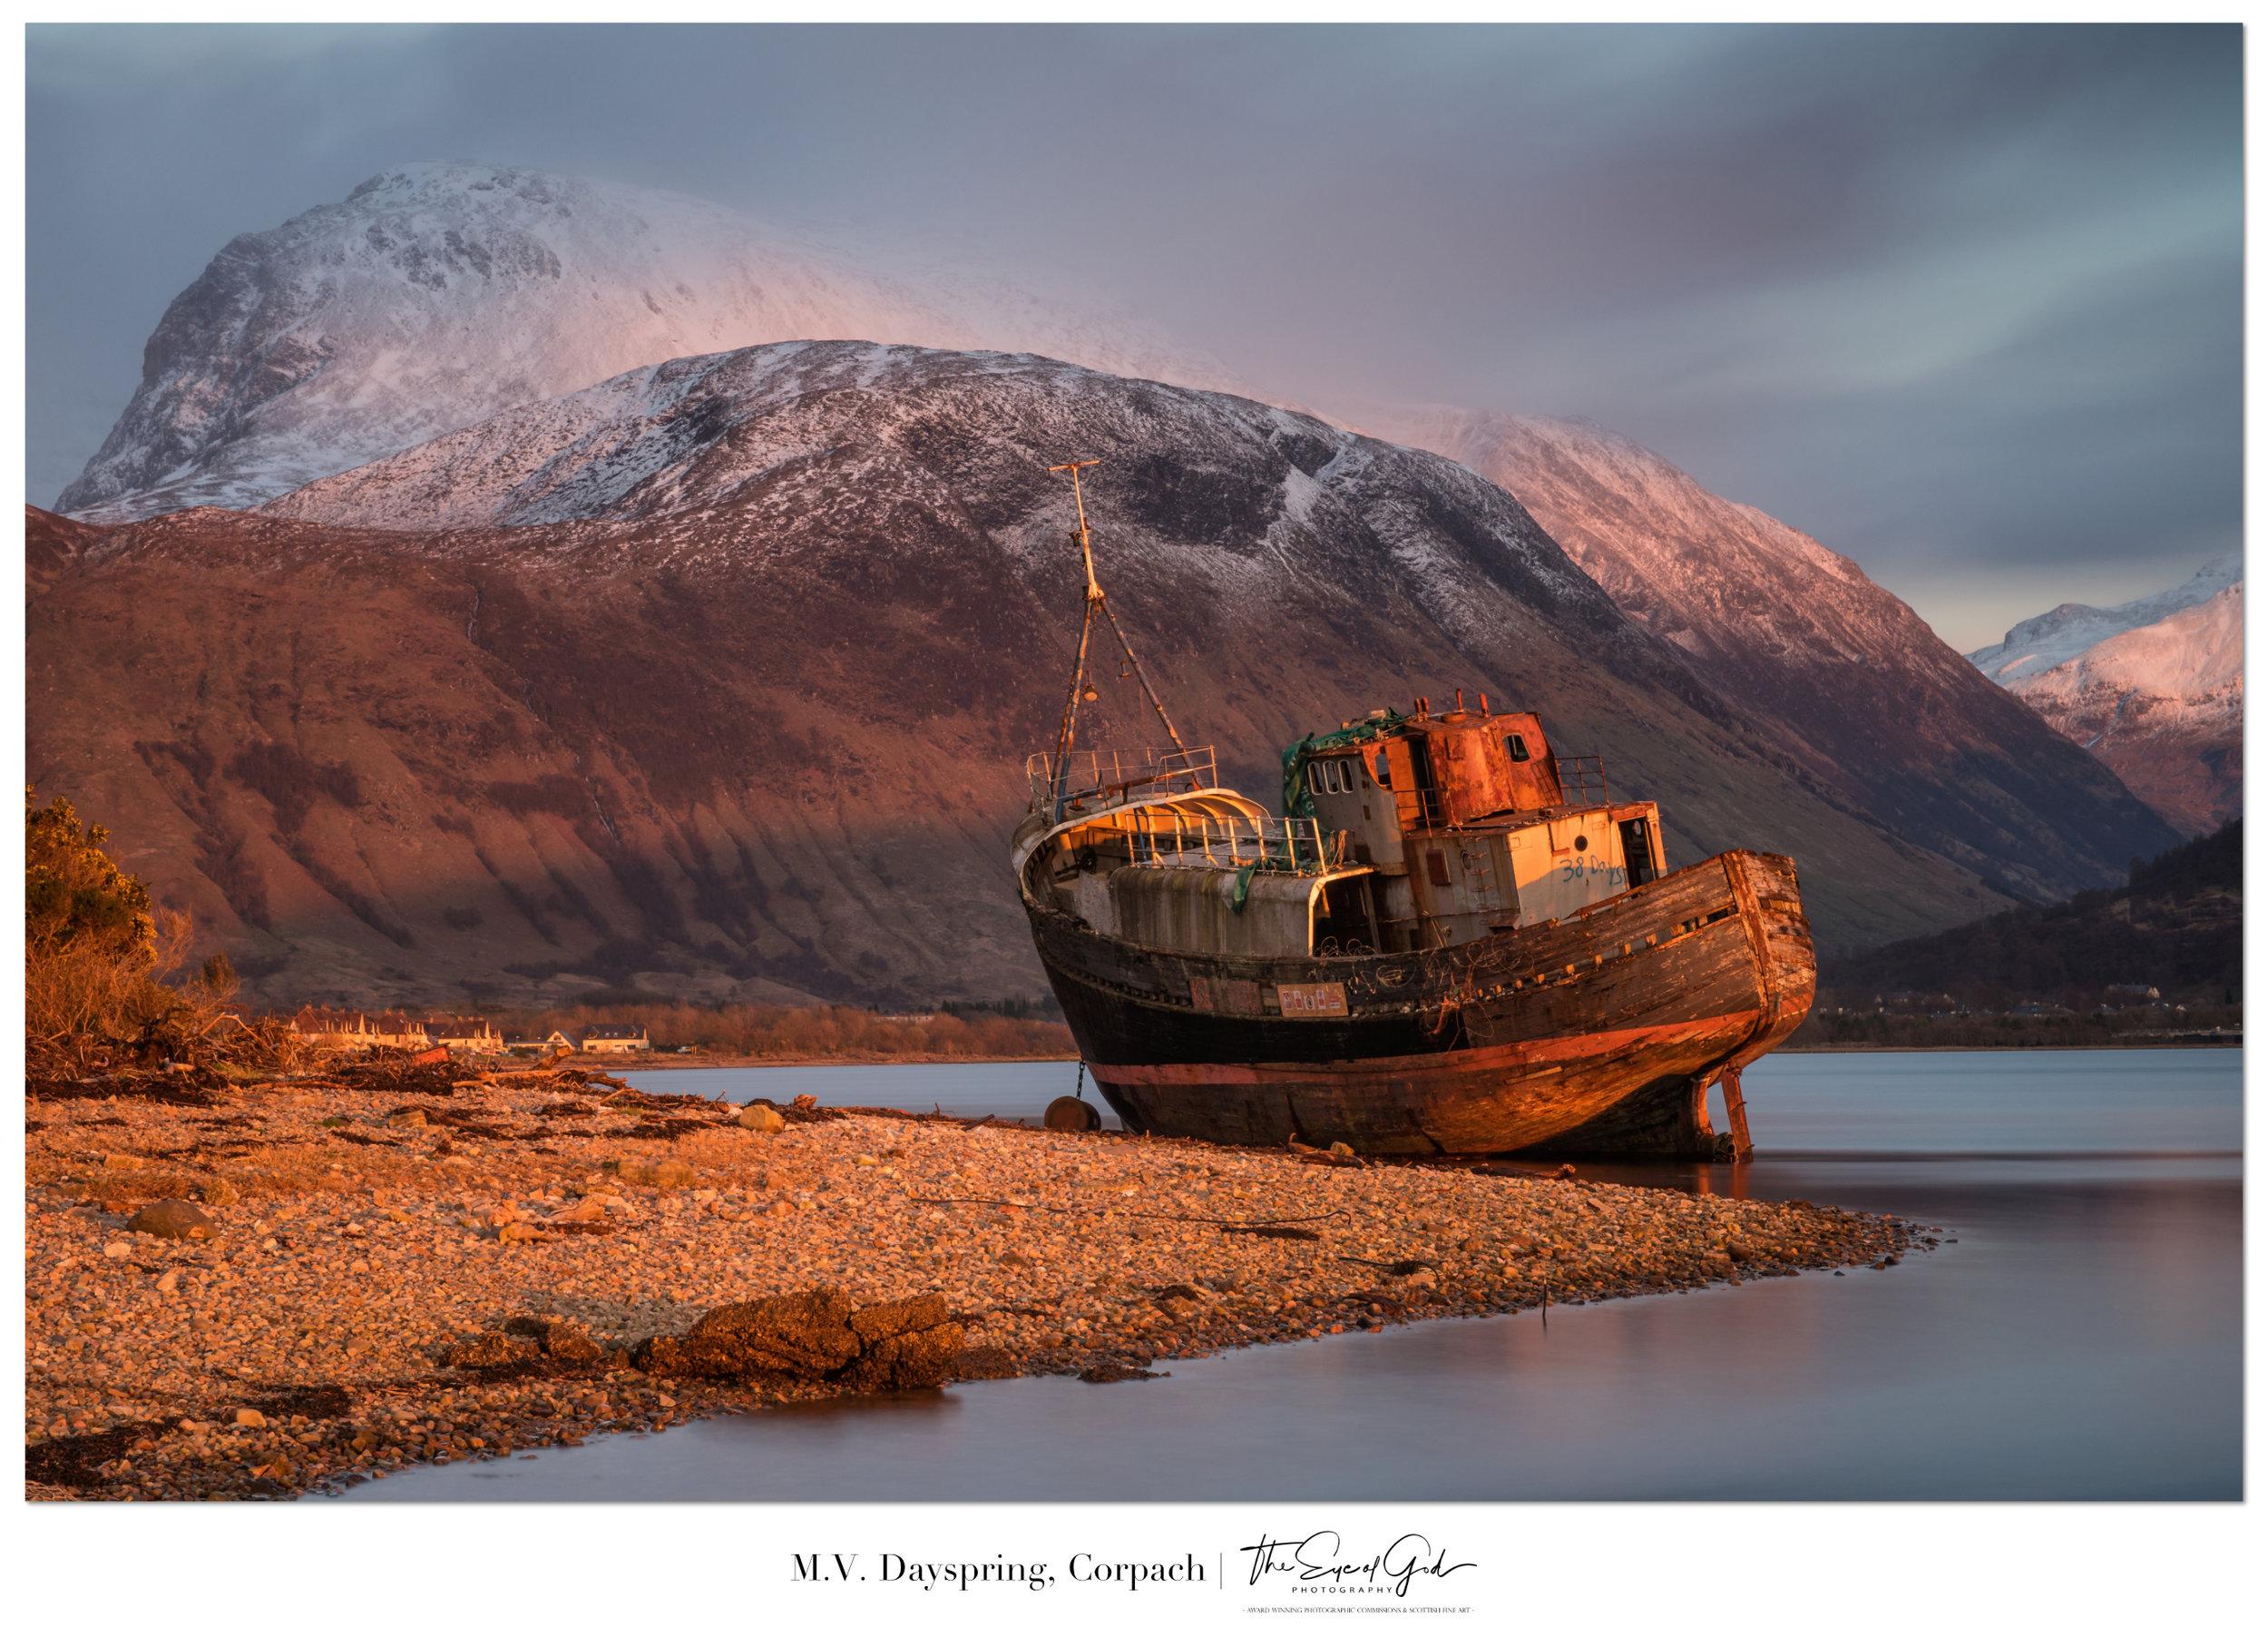 Copyright; Scott Cameron Wanstall | The Eye of God Photography